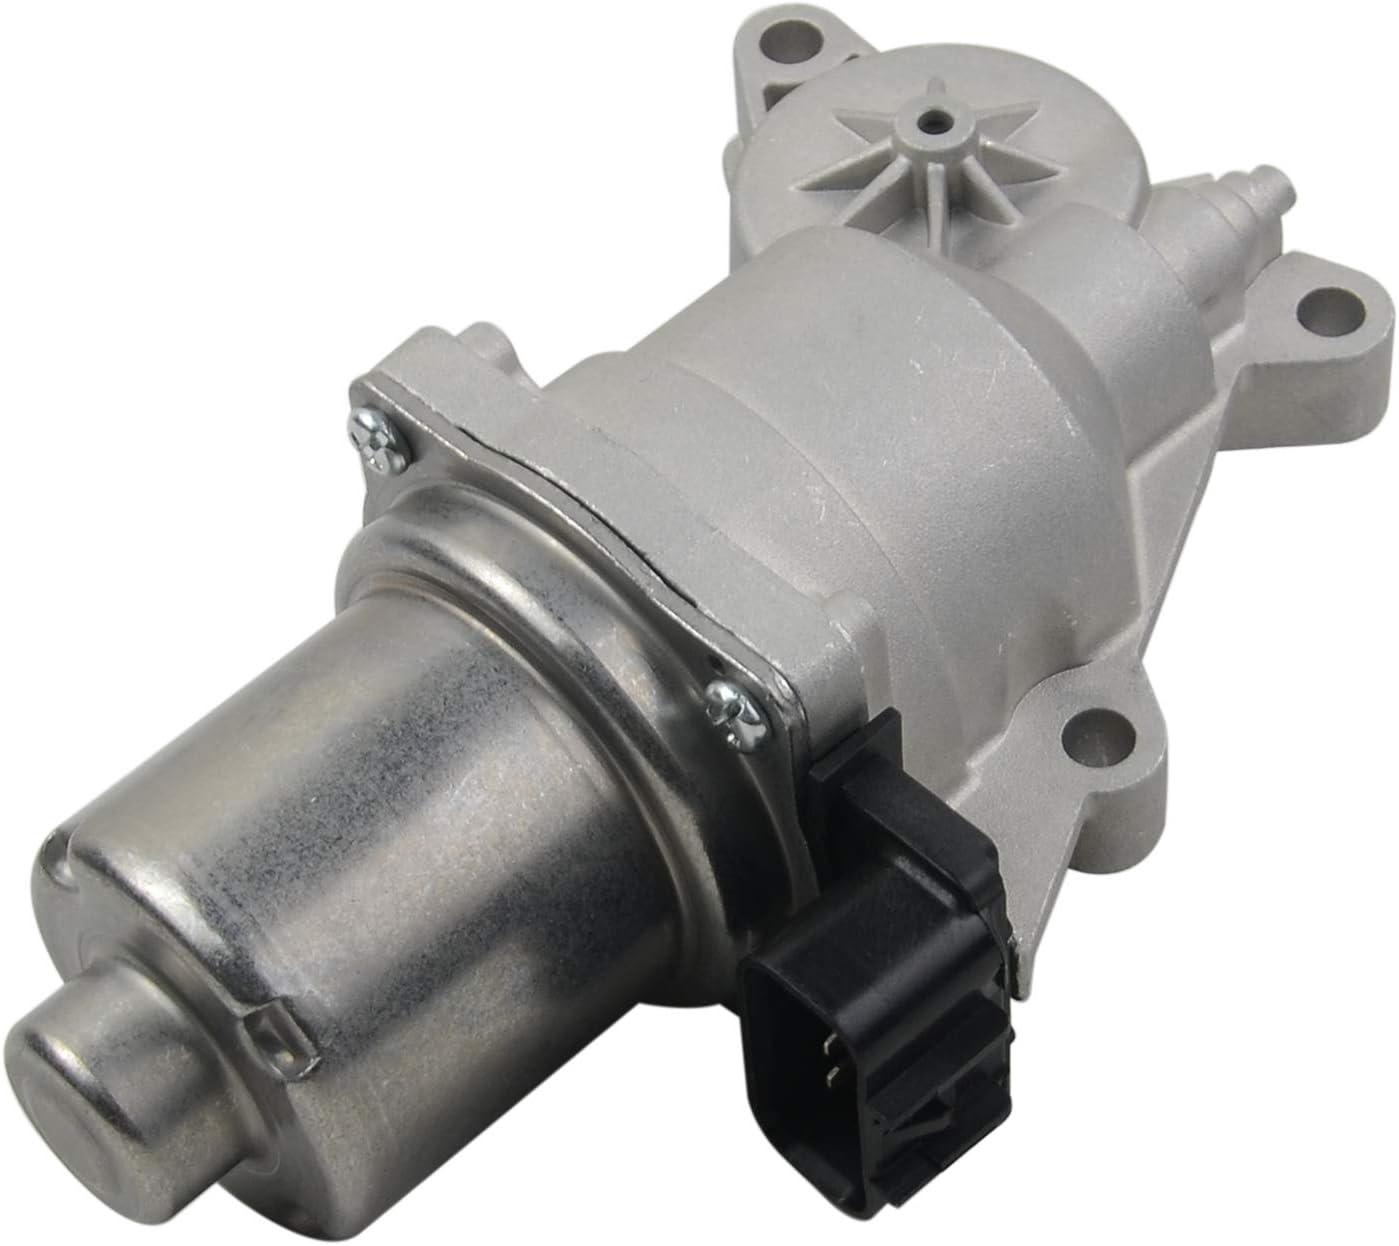 600-899 Transfer Case Motor 23369032 Compatible with Chevrolet Chevy Silverado Suburban Tahoe GMC Sierra Yukon XL 1500//2500//3500 2007-2018